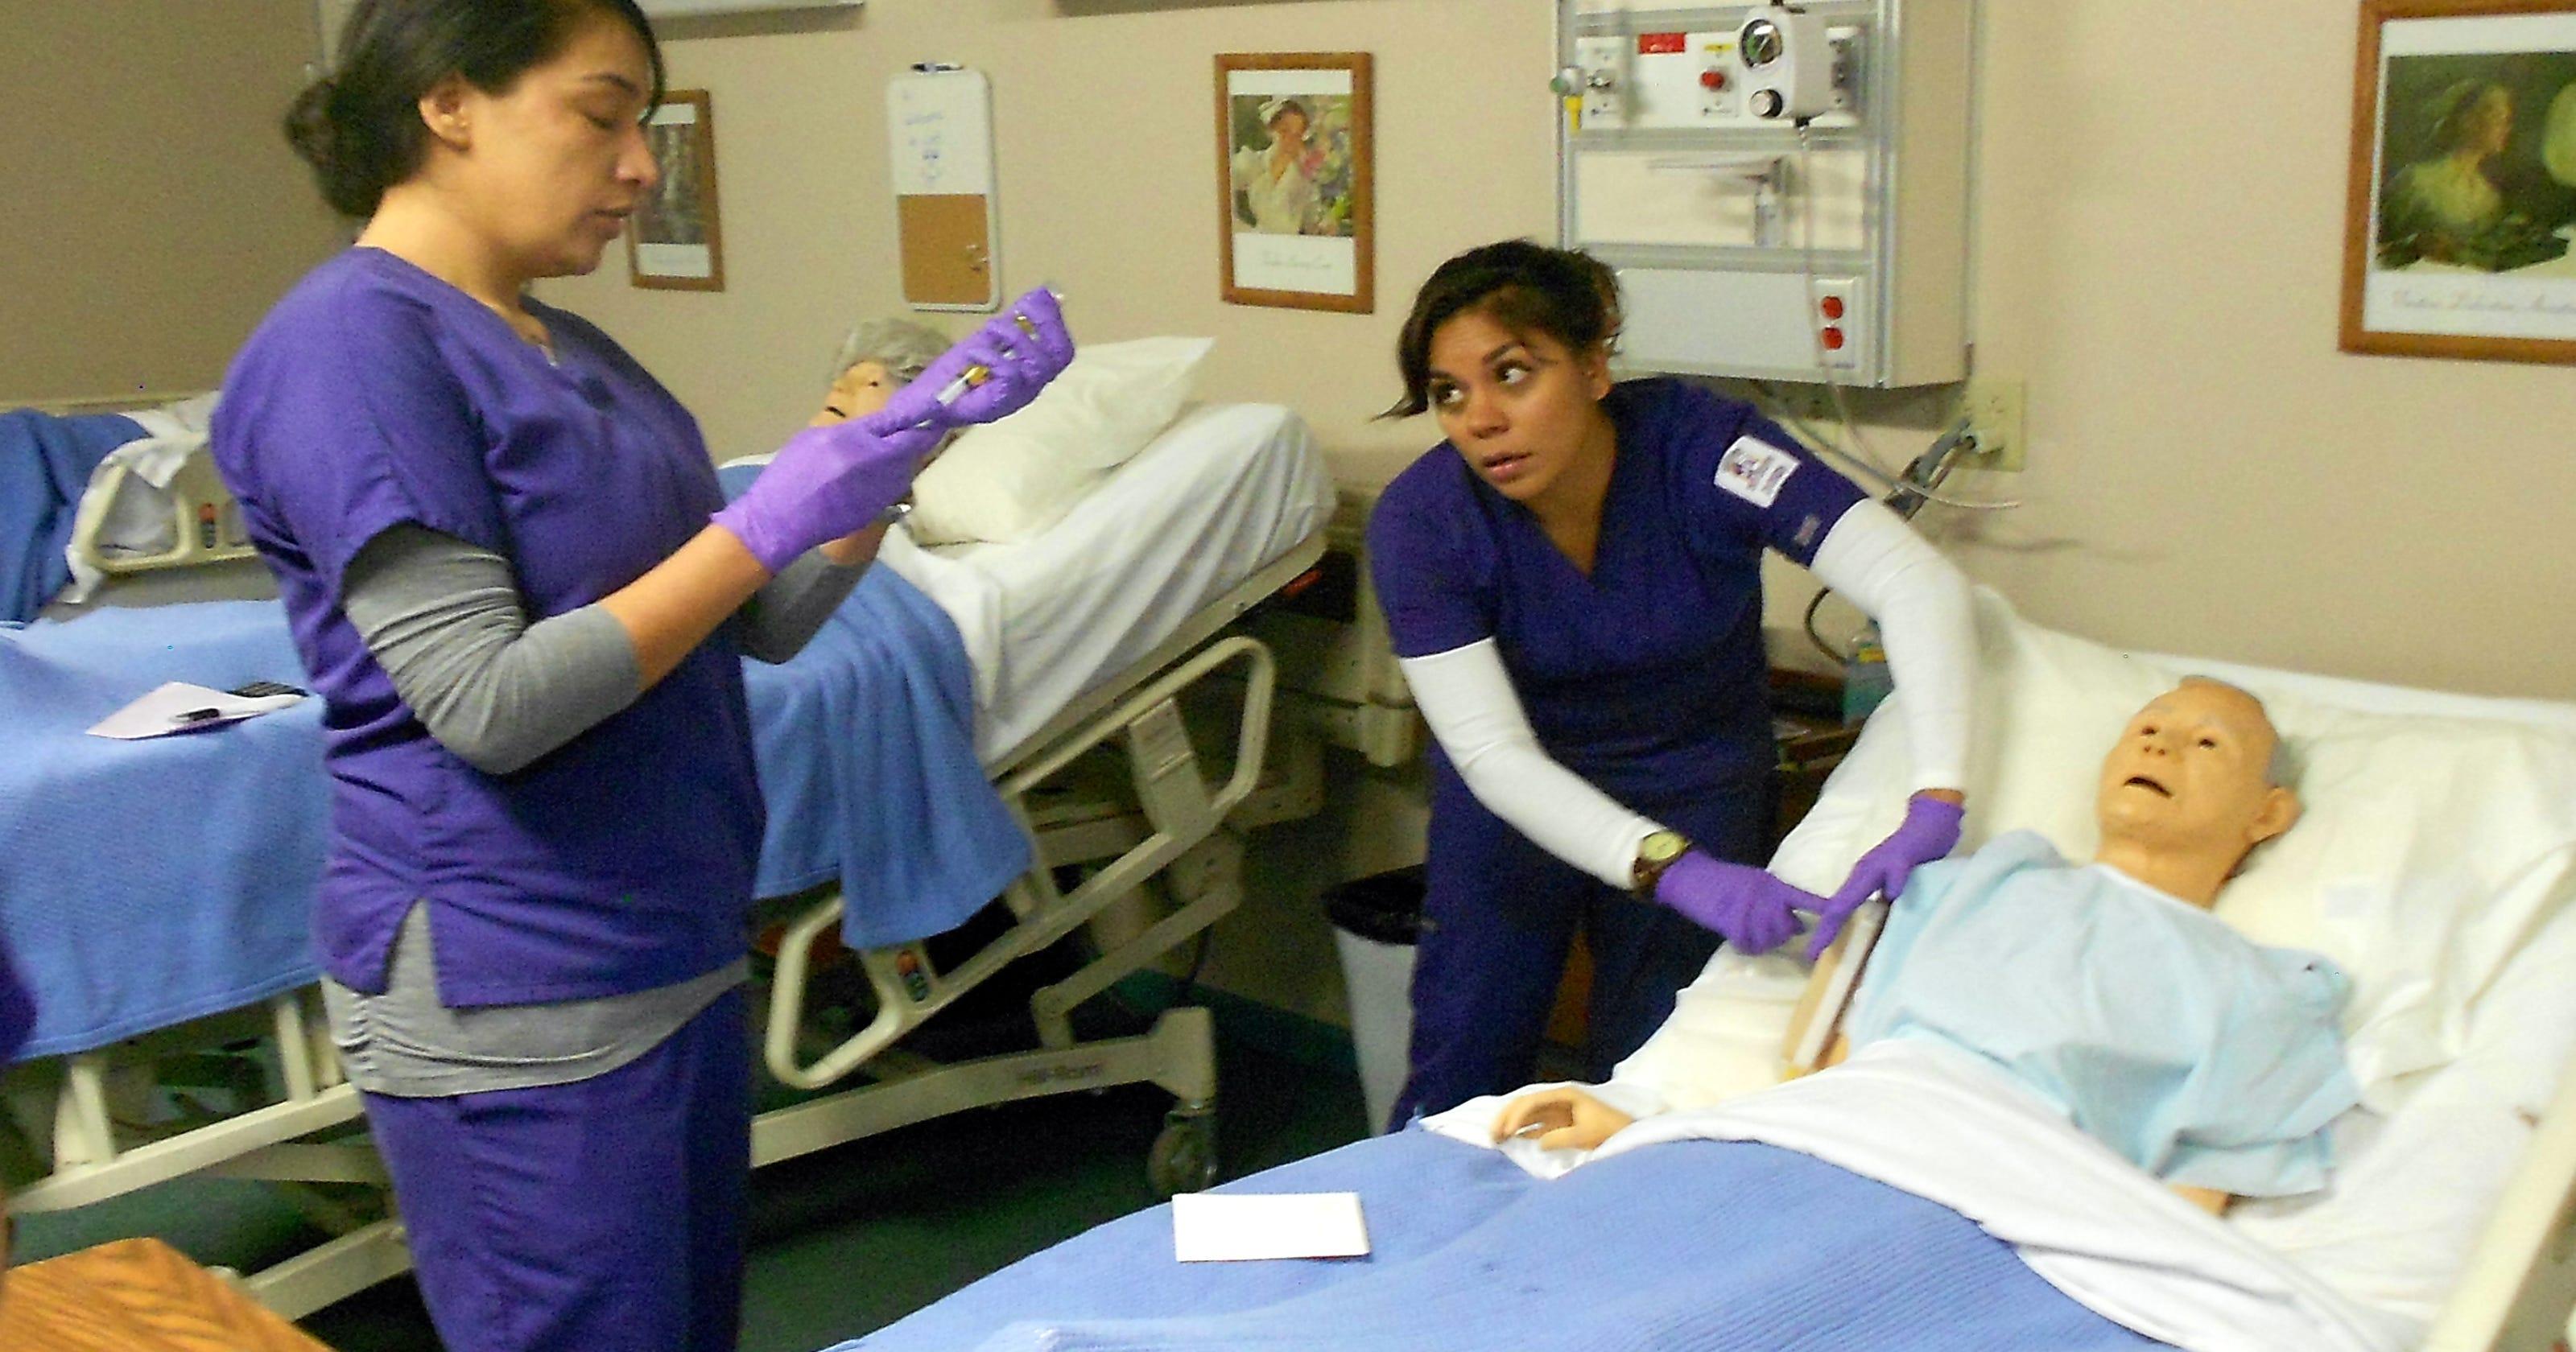 New graduate nursing programs available at WNMU